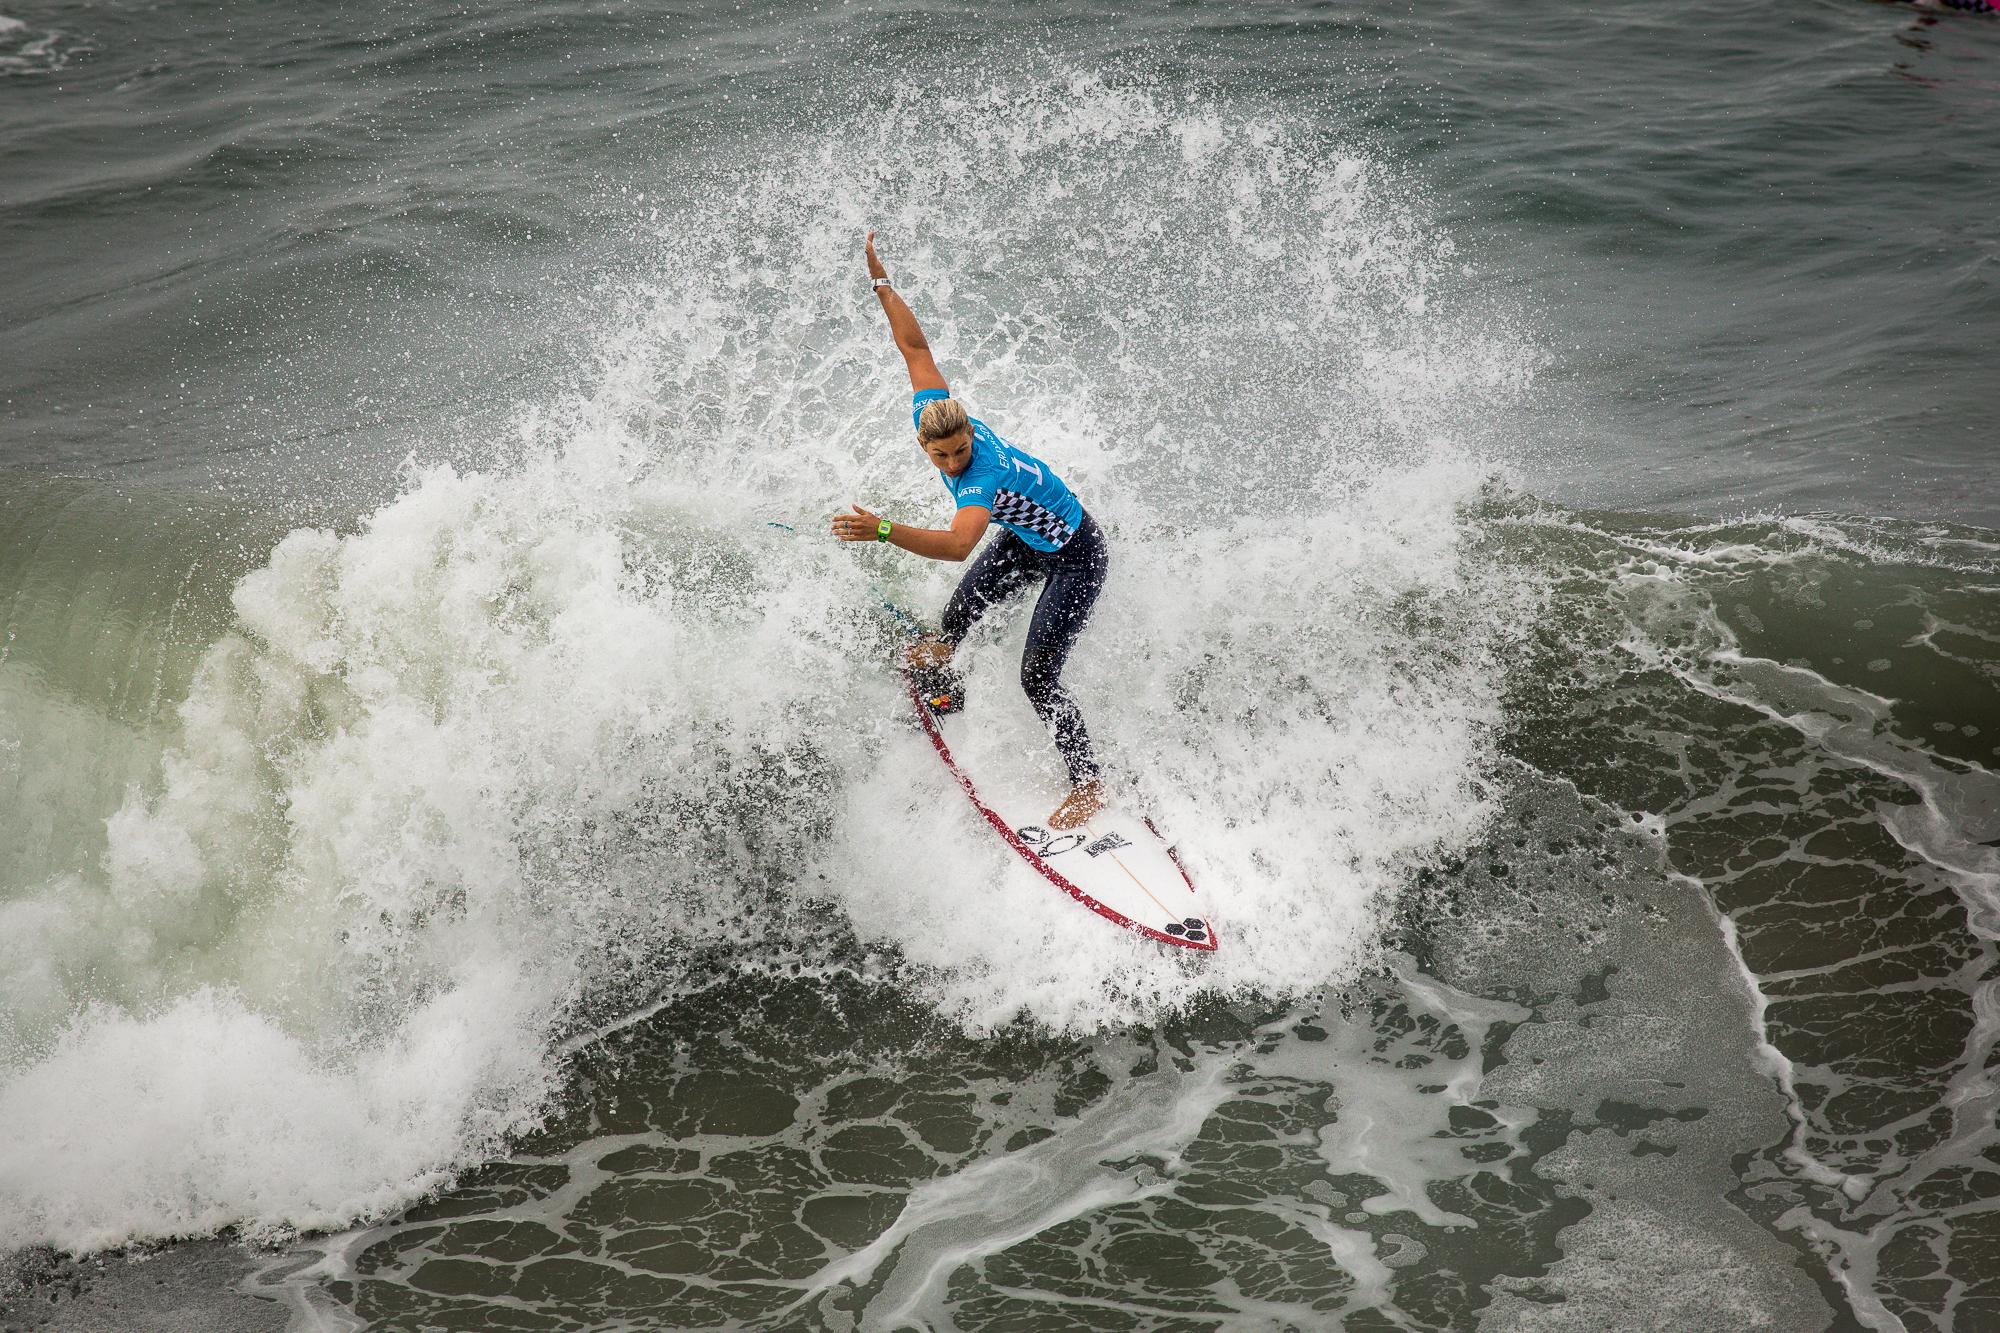 Sage Erickson, winner of the Van's US Open of Surf